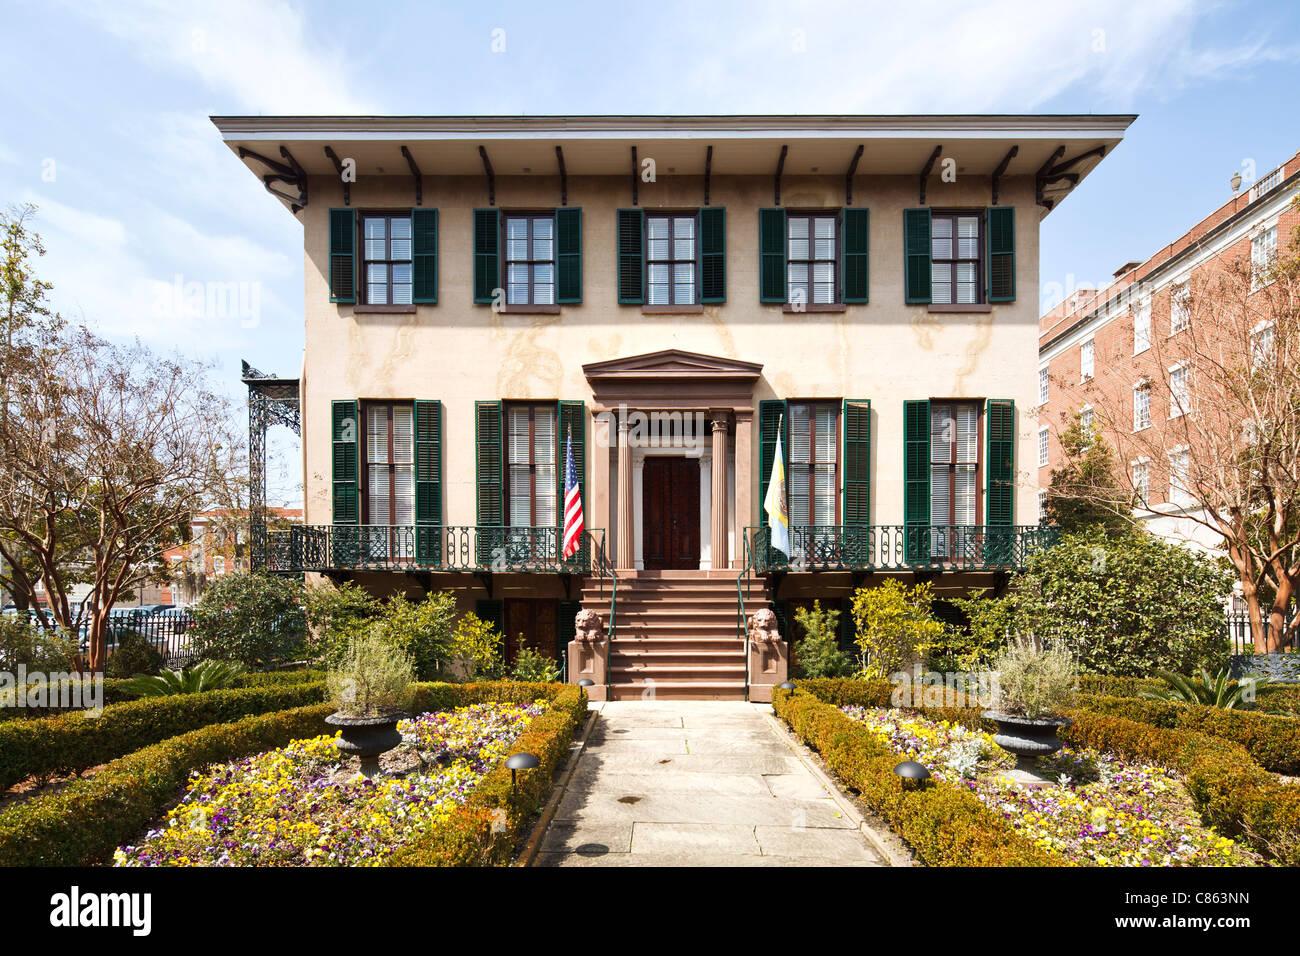 Andrew Low house, Savannah Photo Stock